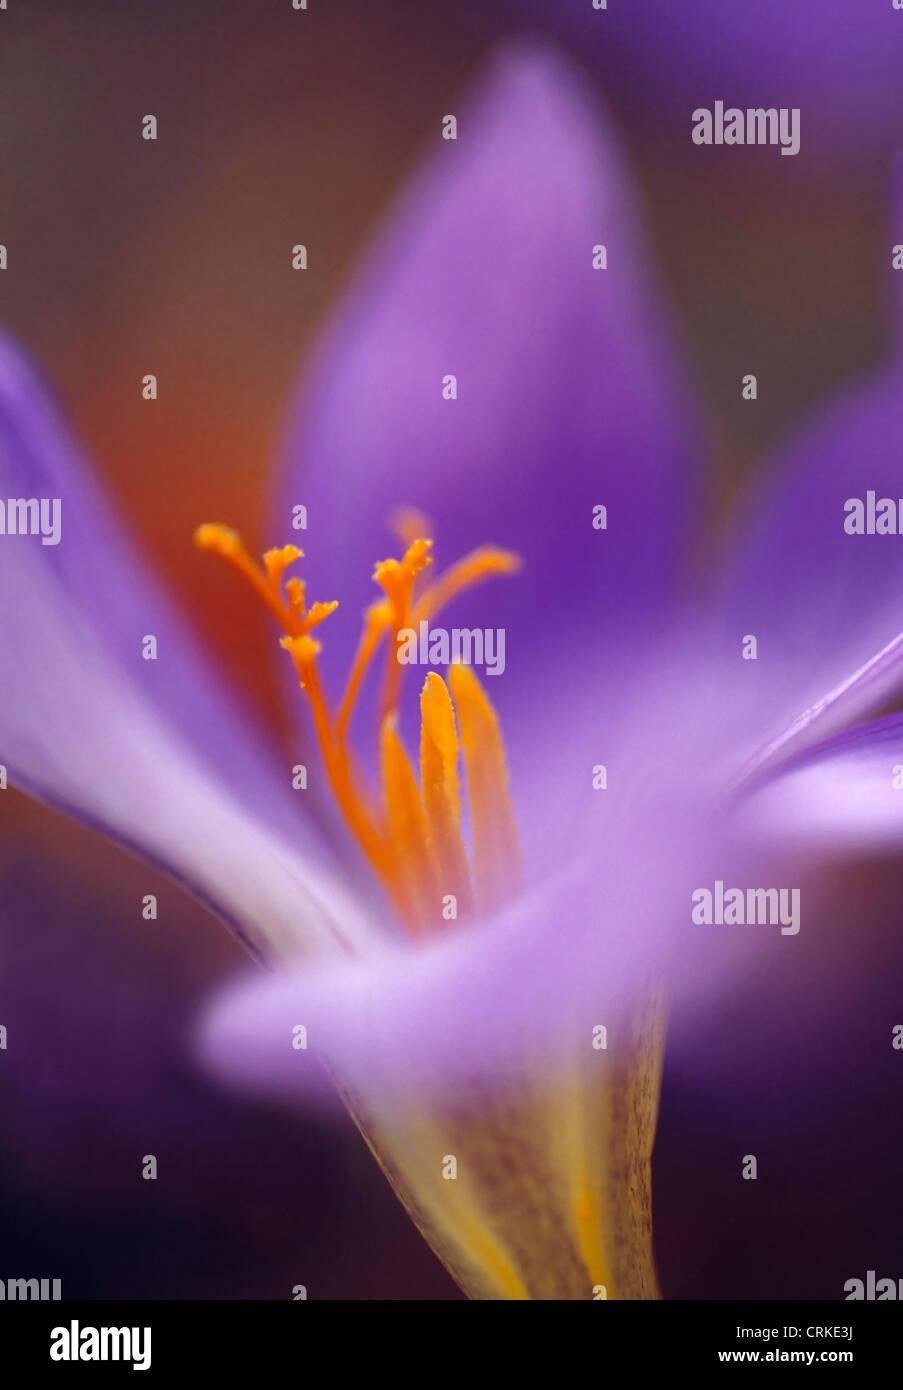 Colchicum autumn crocus close up of purple flower with yellow close up of purple flower with yellow stamen mightylinksfo Choice Image